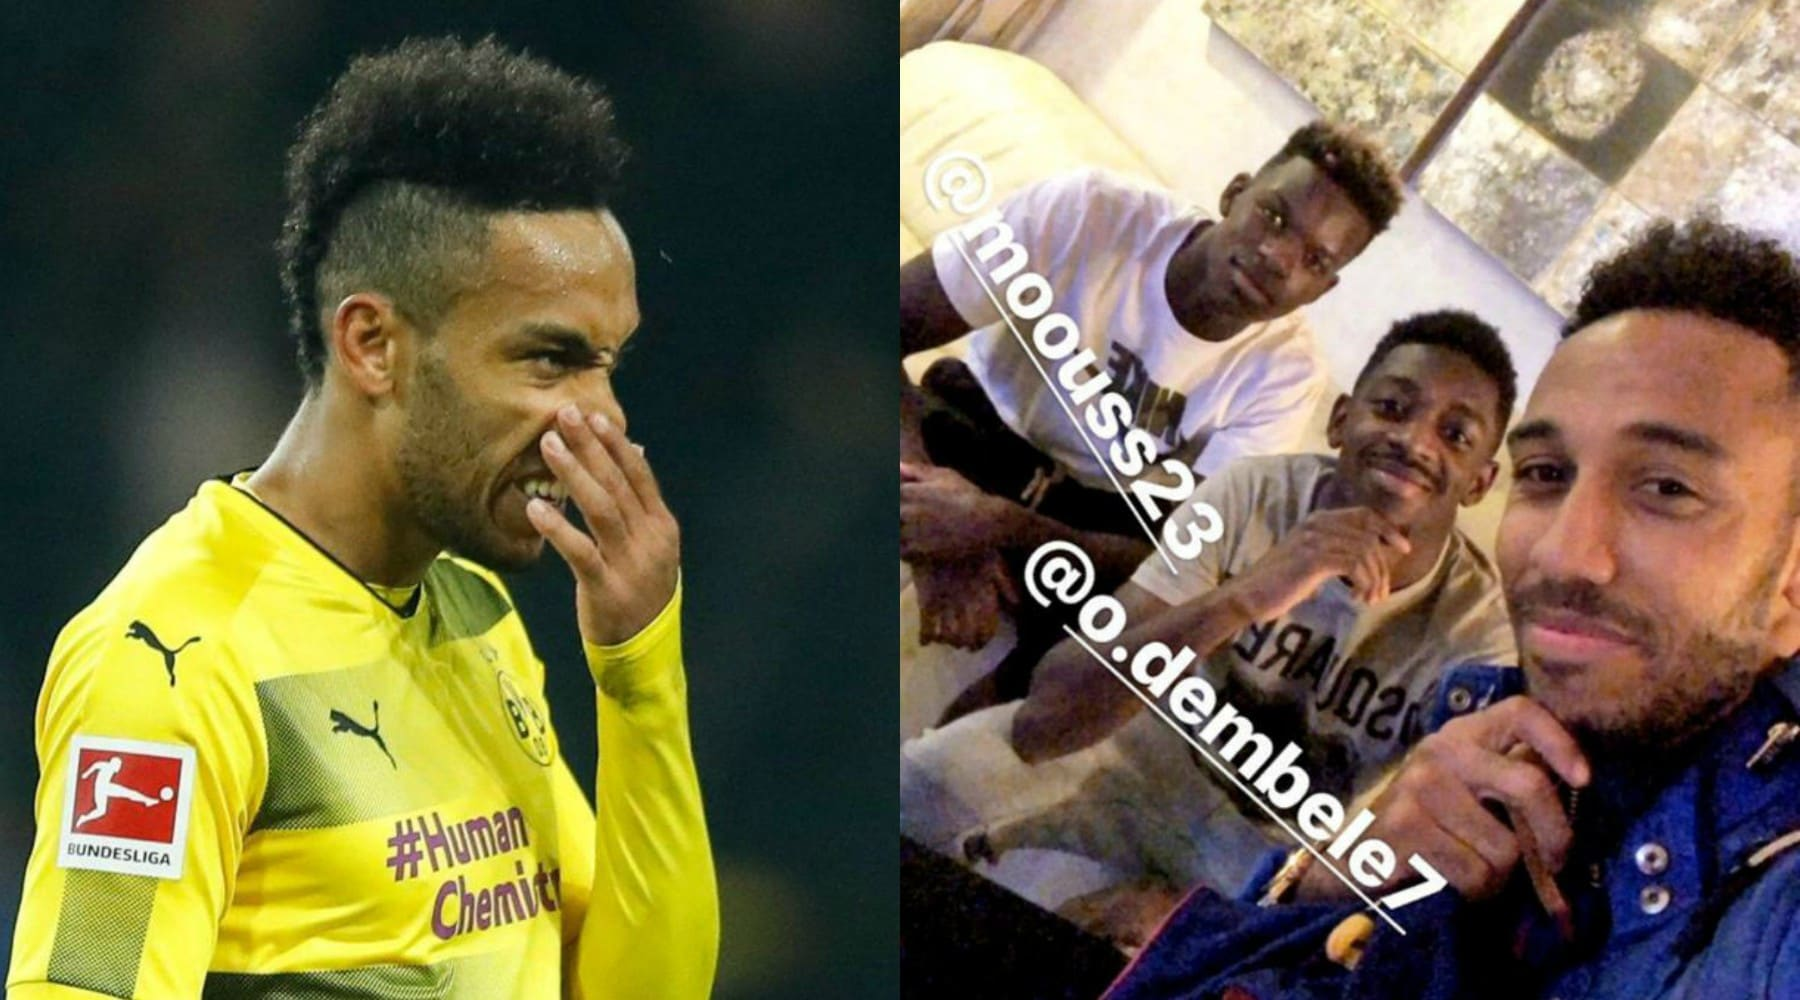 Borussia Dortmund, bufera su Aubameyang: escluso per motivi disciplinari